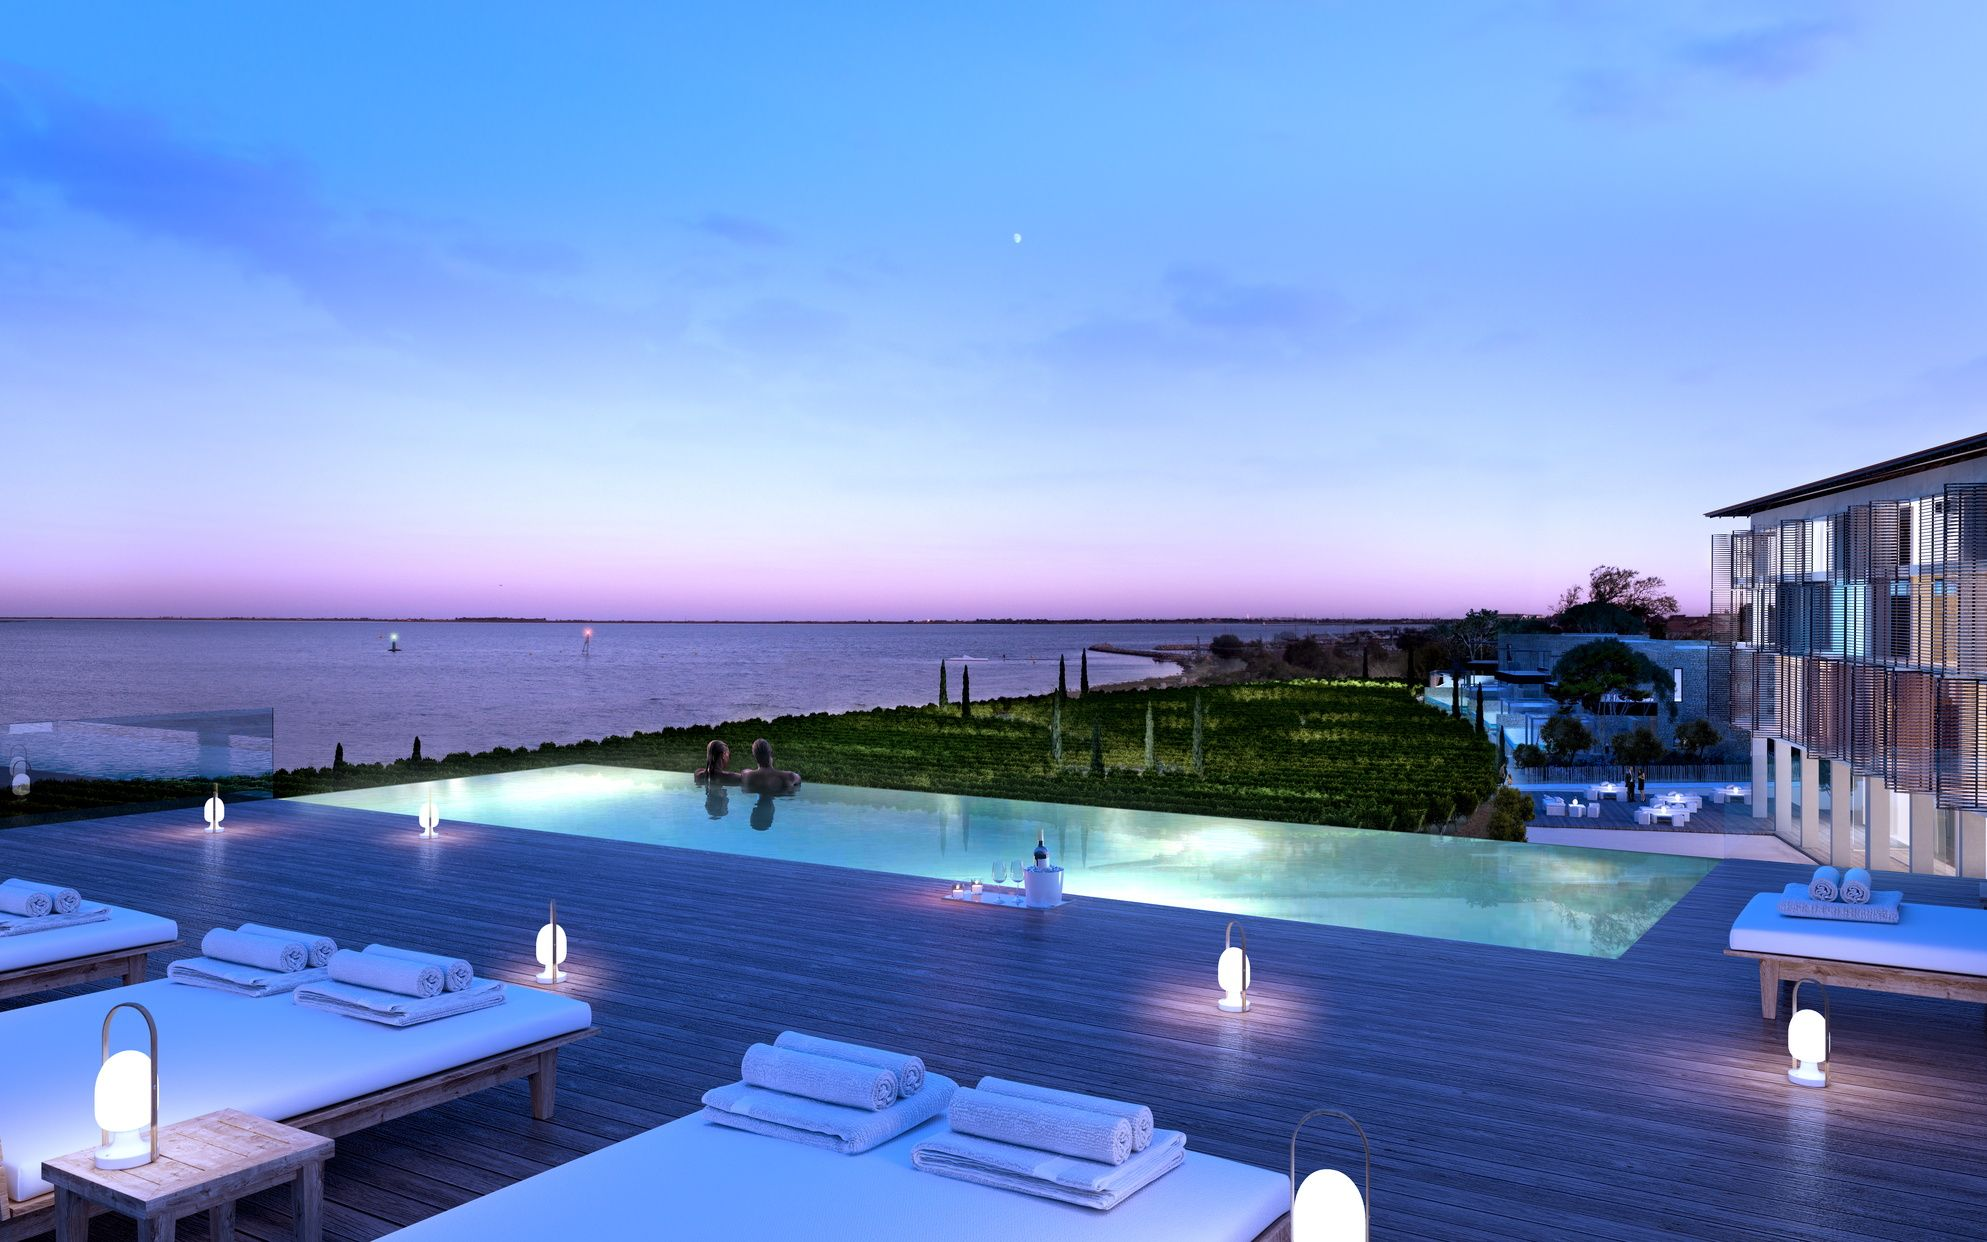 LUX* La Baraquette Resort & Residences